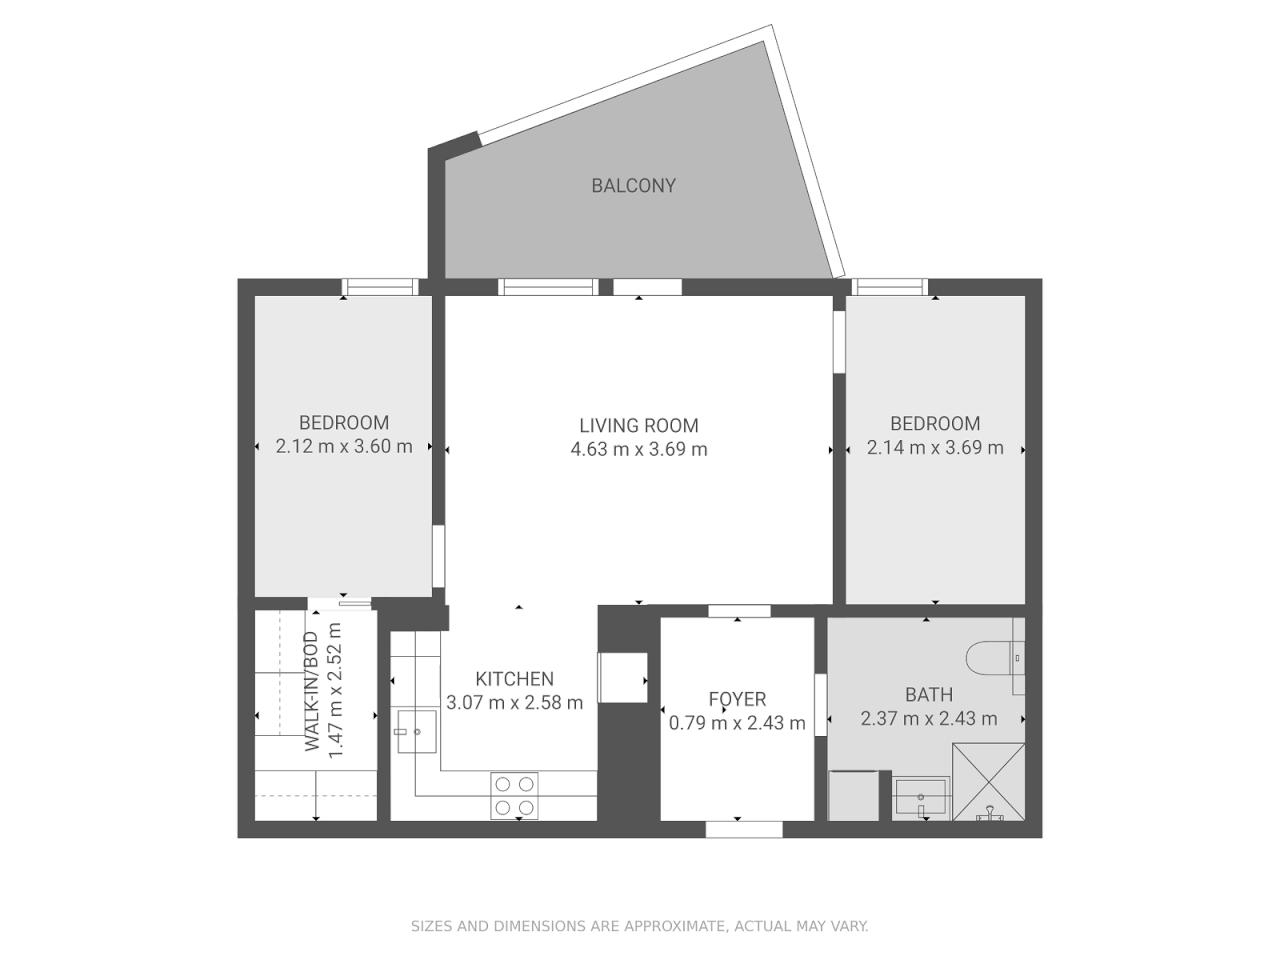 Floor plan theme: Grayscale